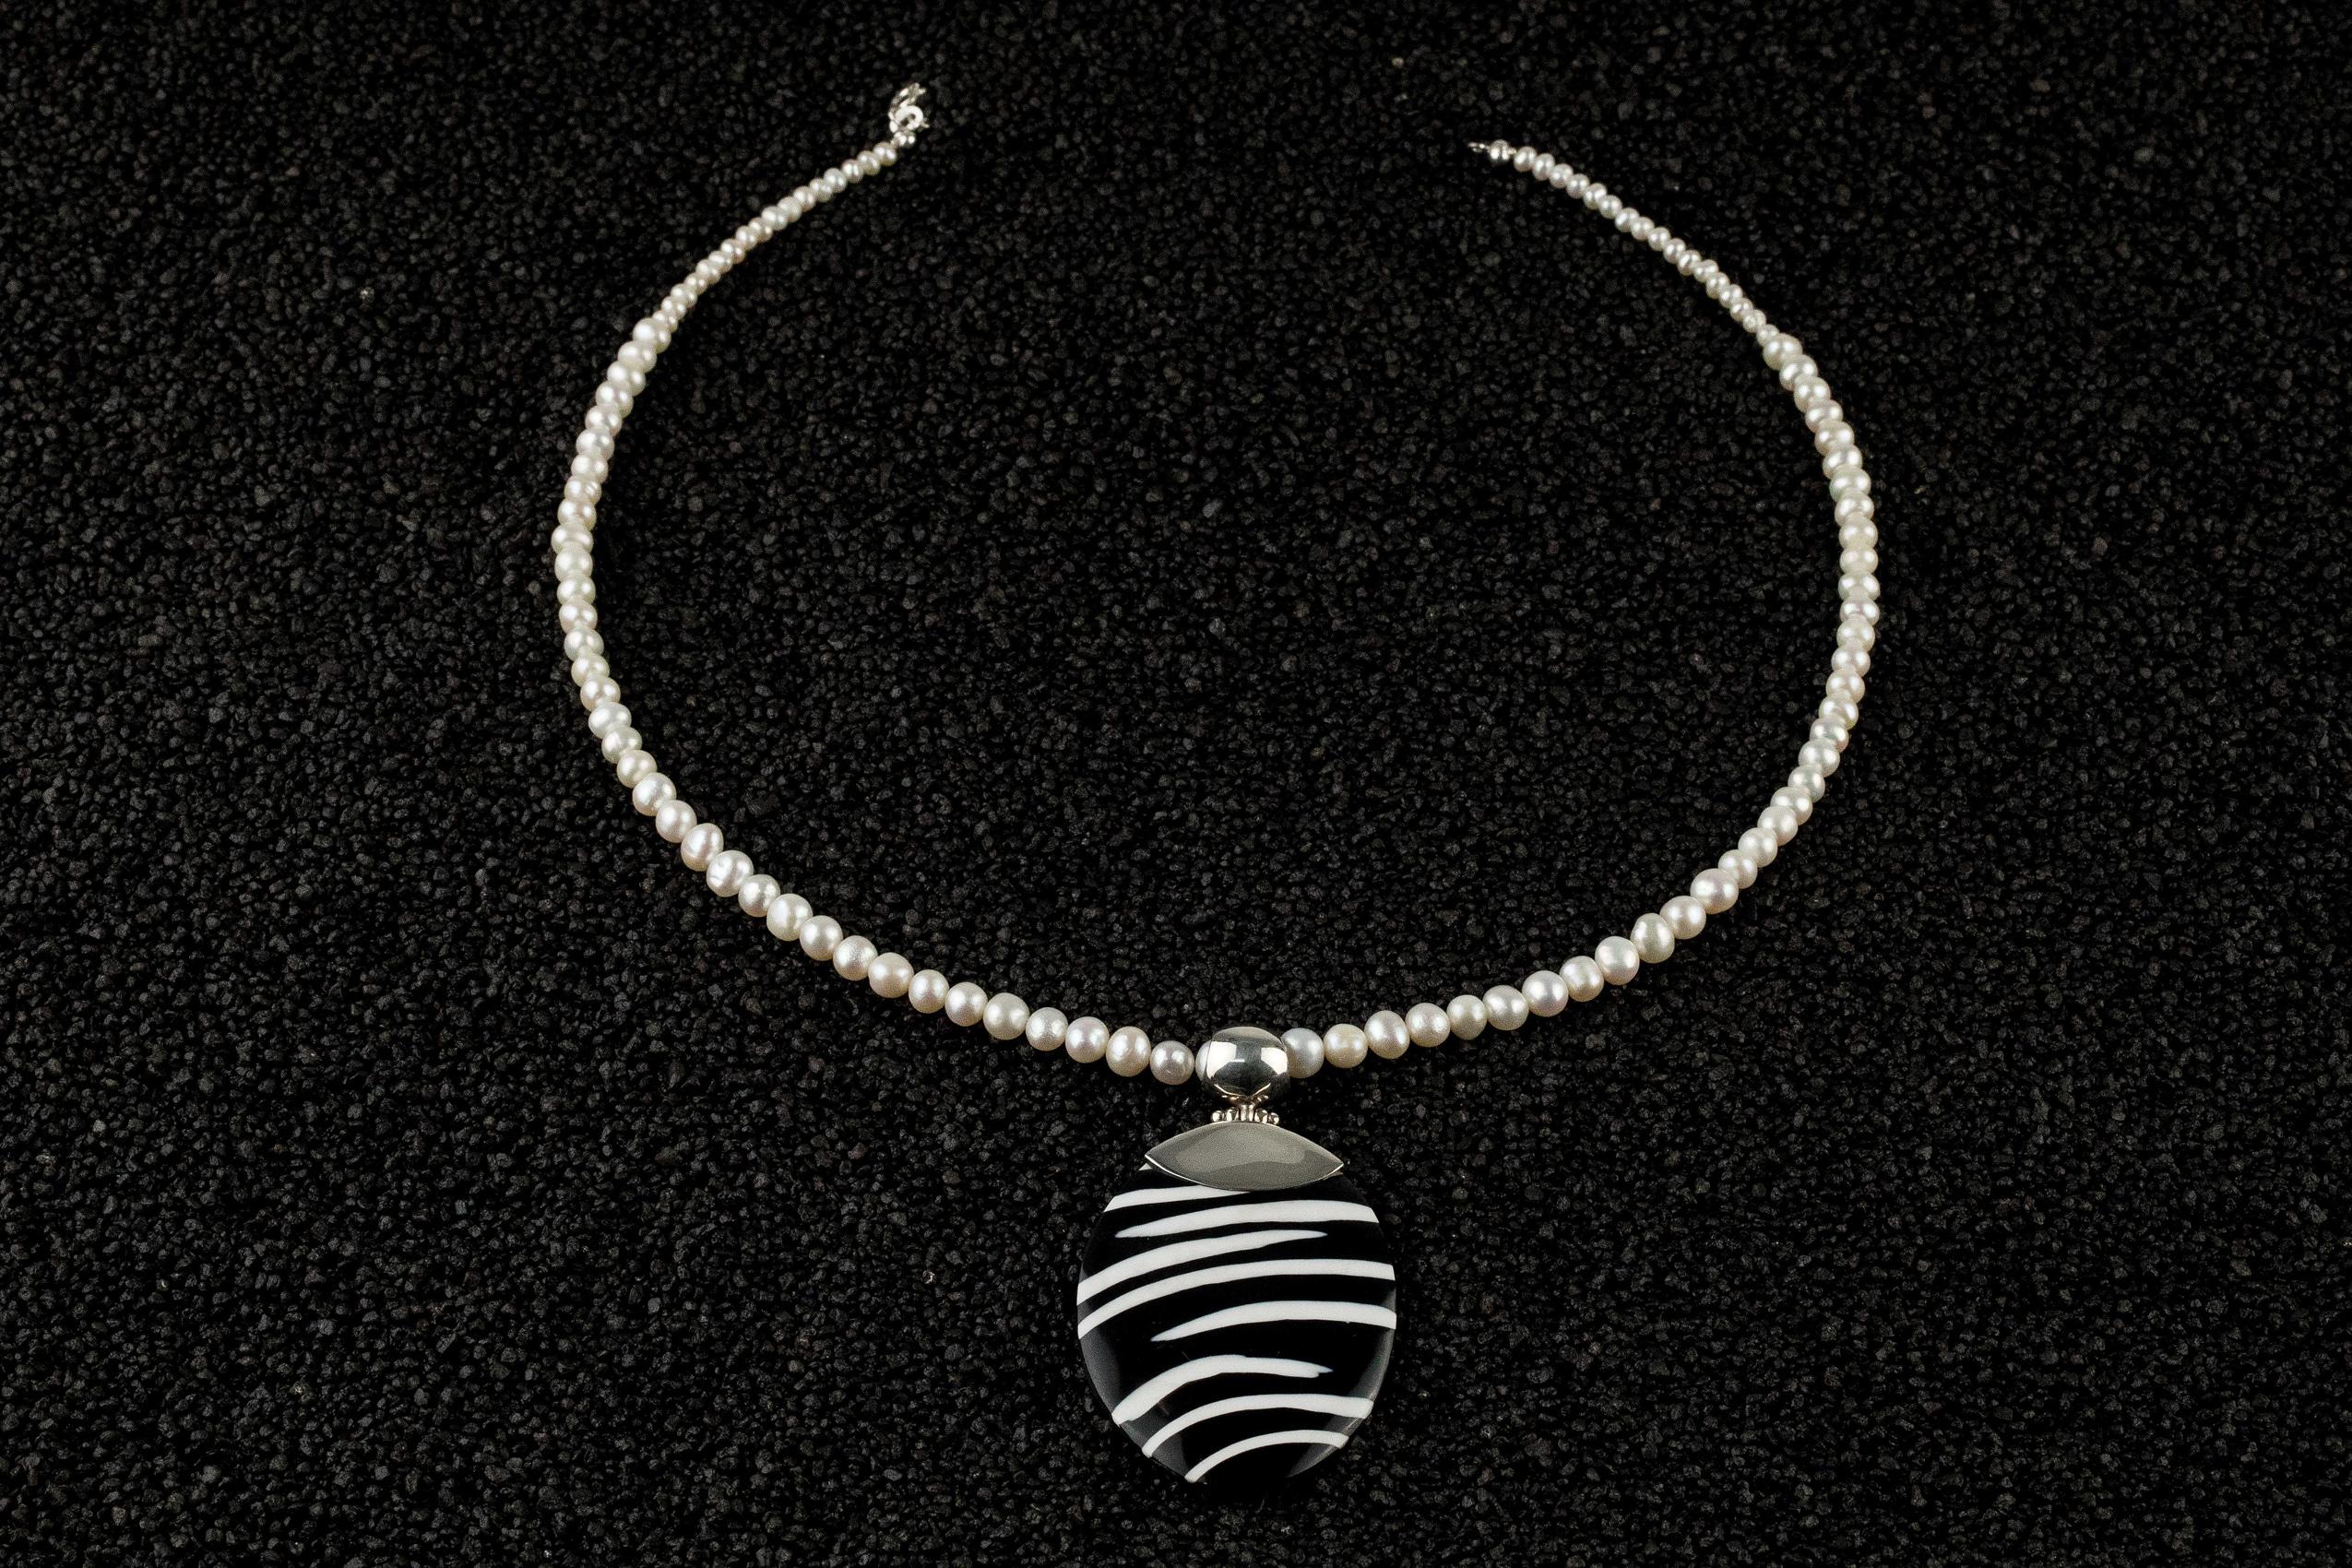 Colier unicat cu pandantiv argint 925 sidef alb si negru si perle albe de cultura